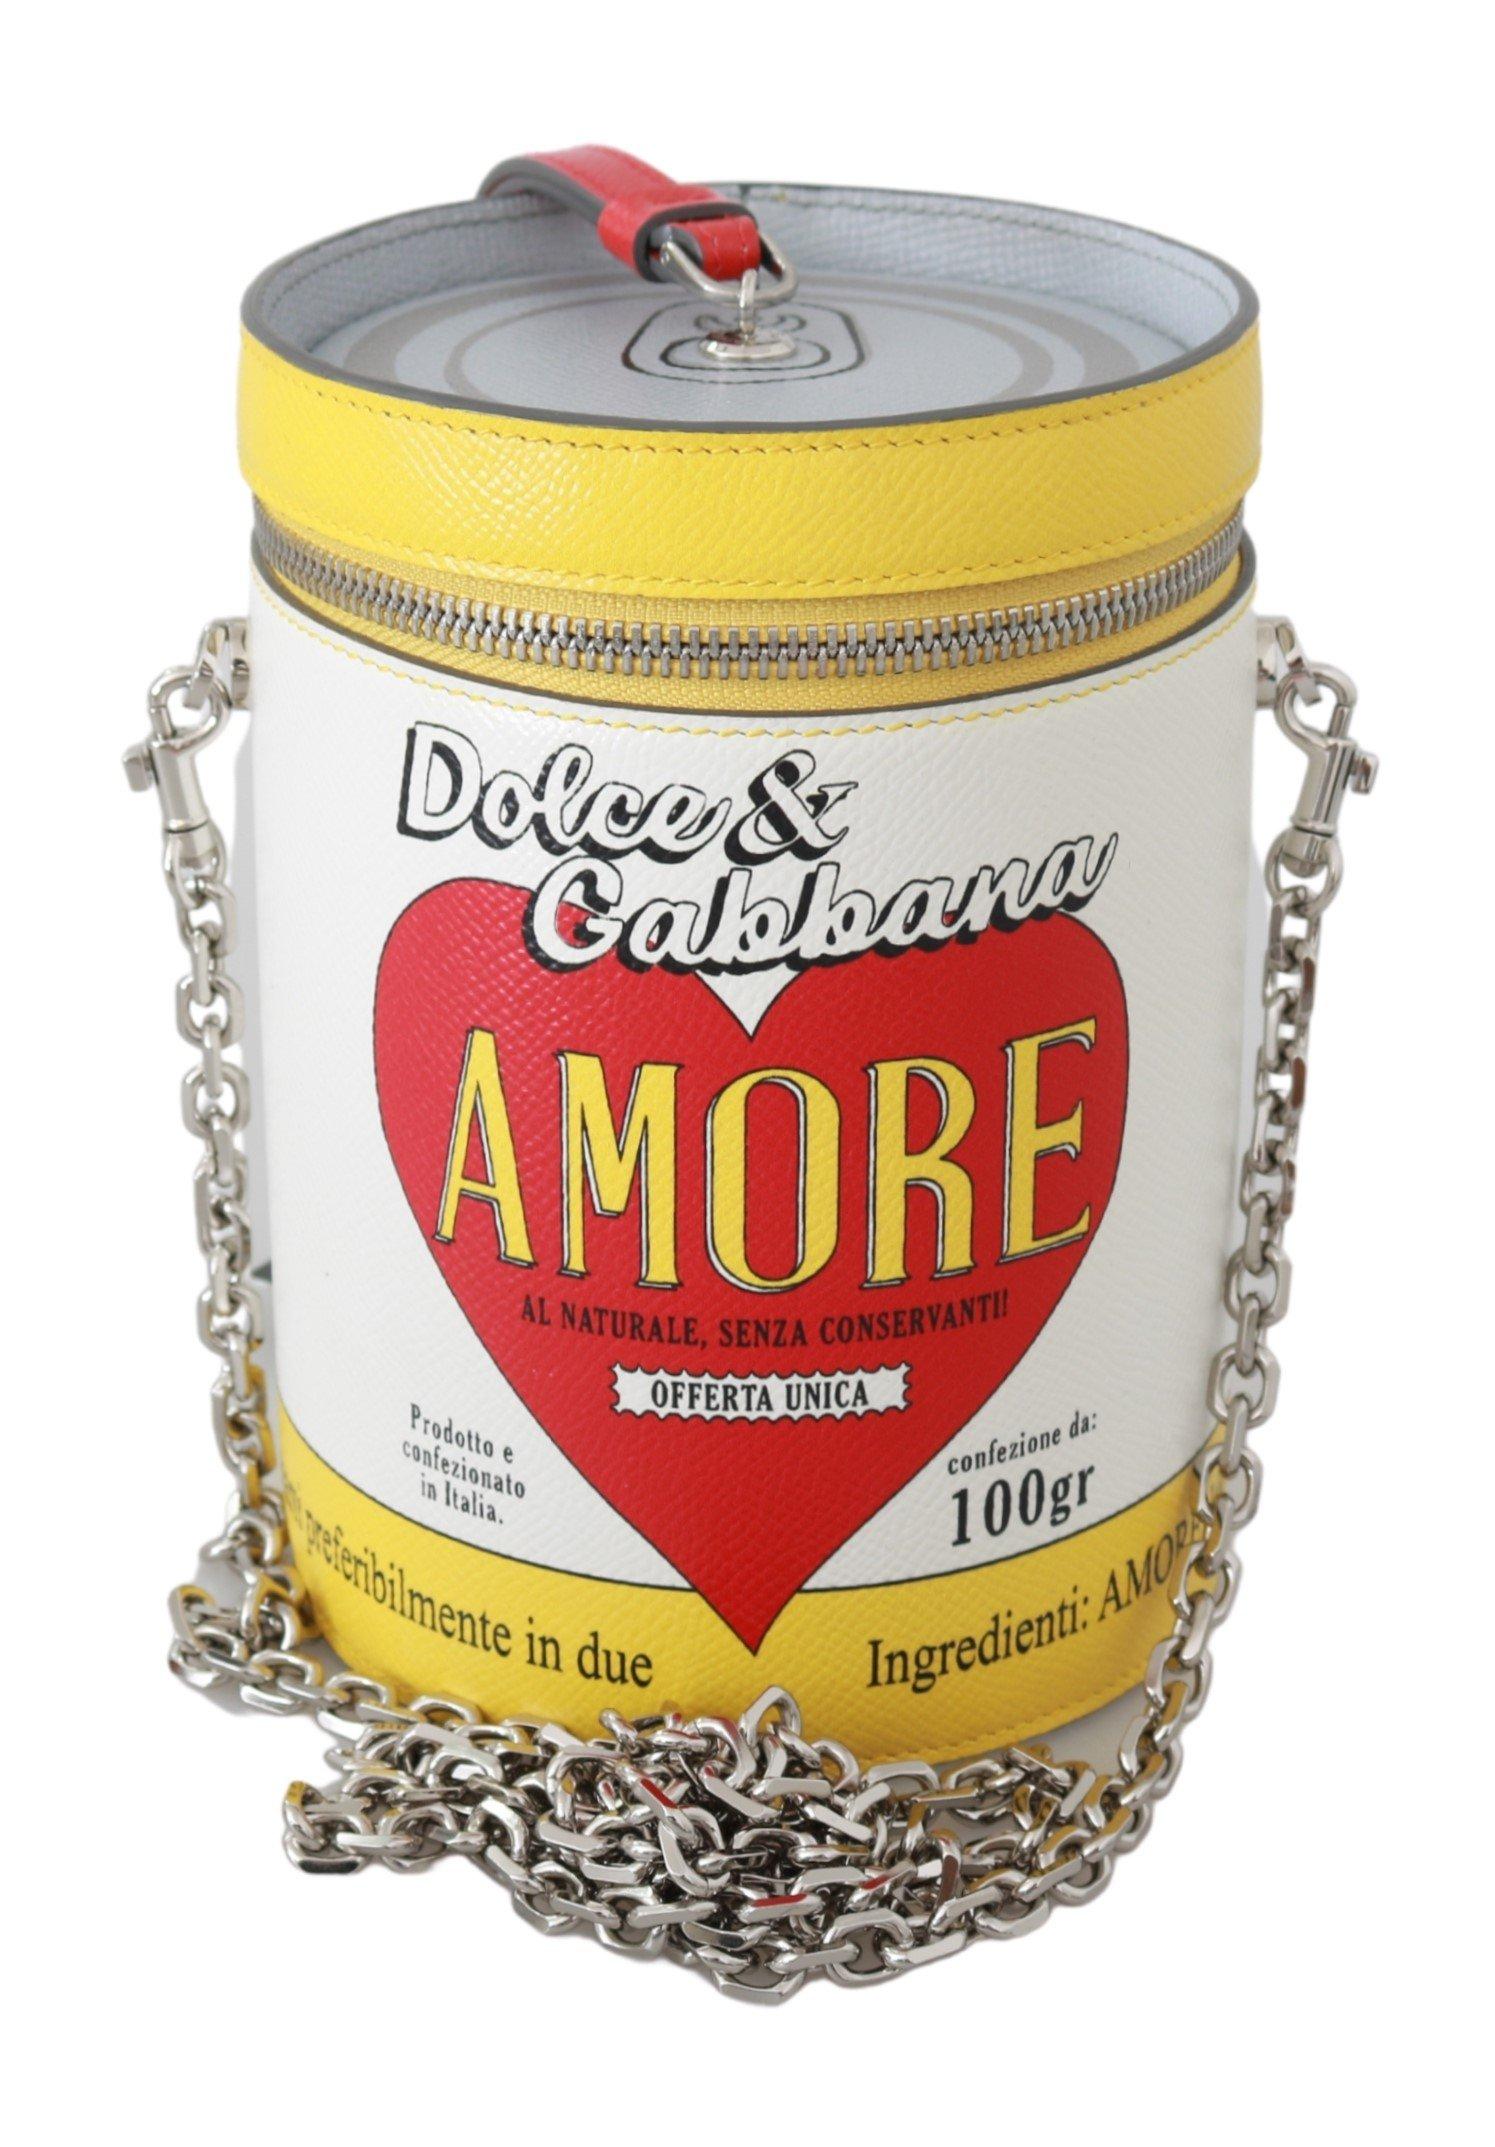 Dolce & Gabbana Women's Amore Round Leather Crossbody Bag White VAS9237